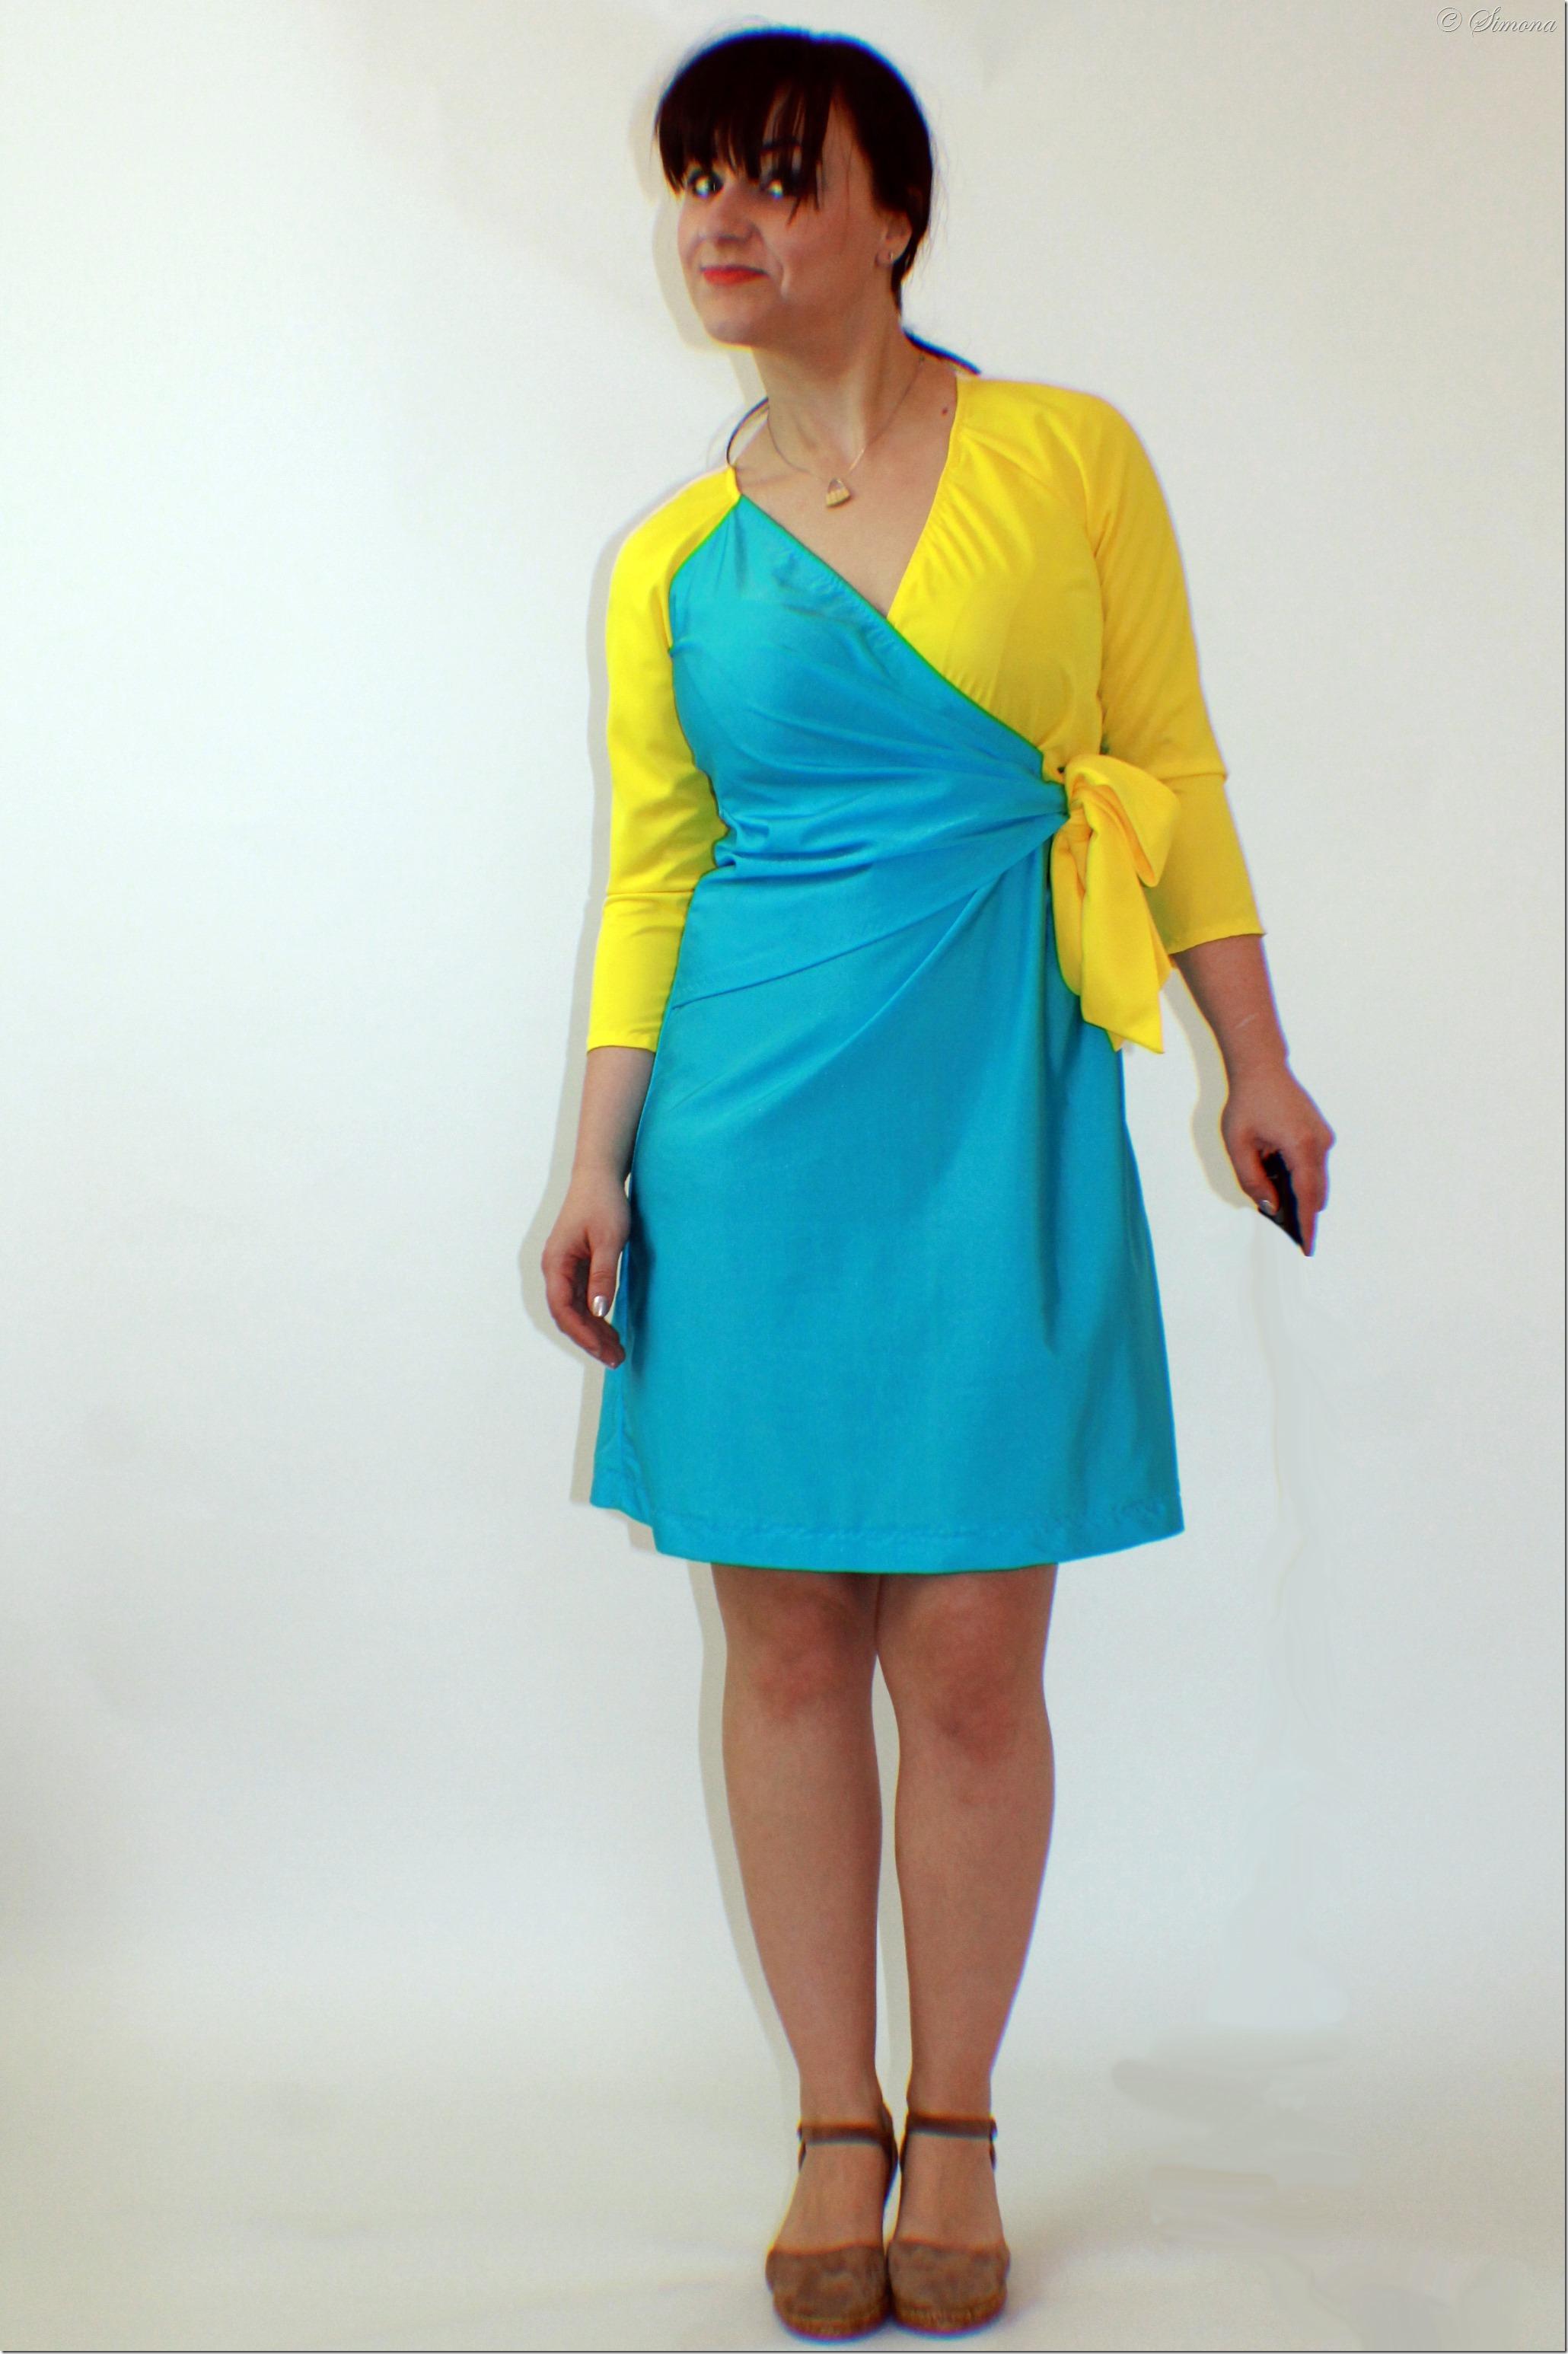 Simplicity dress 56